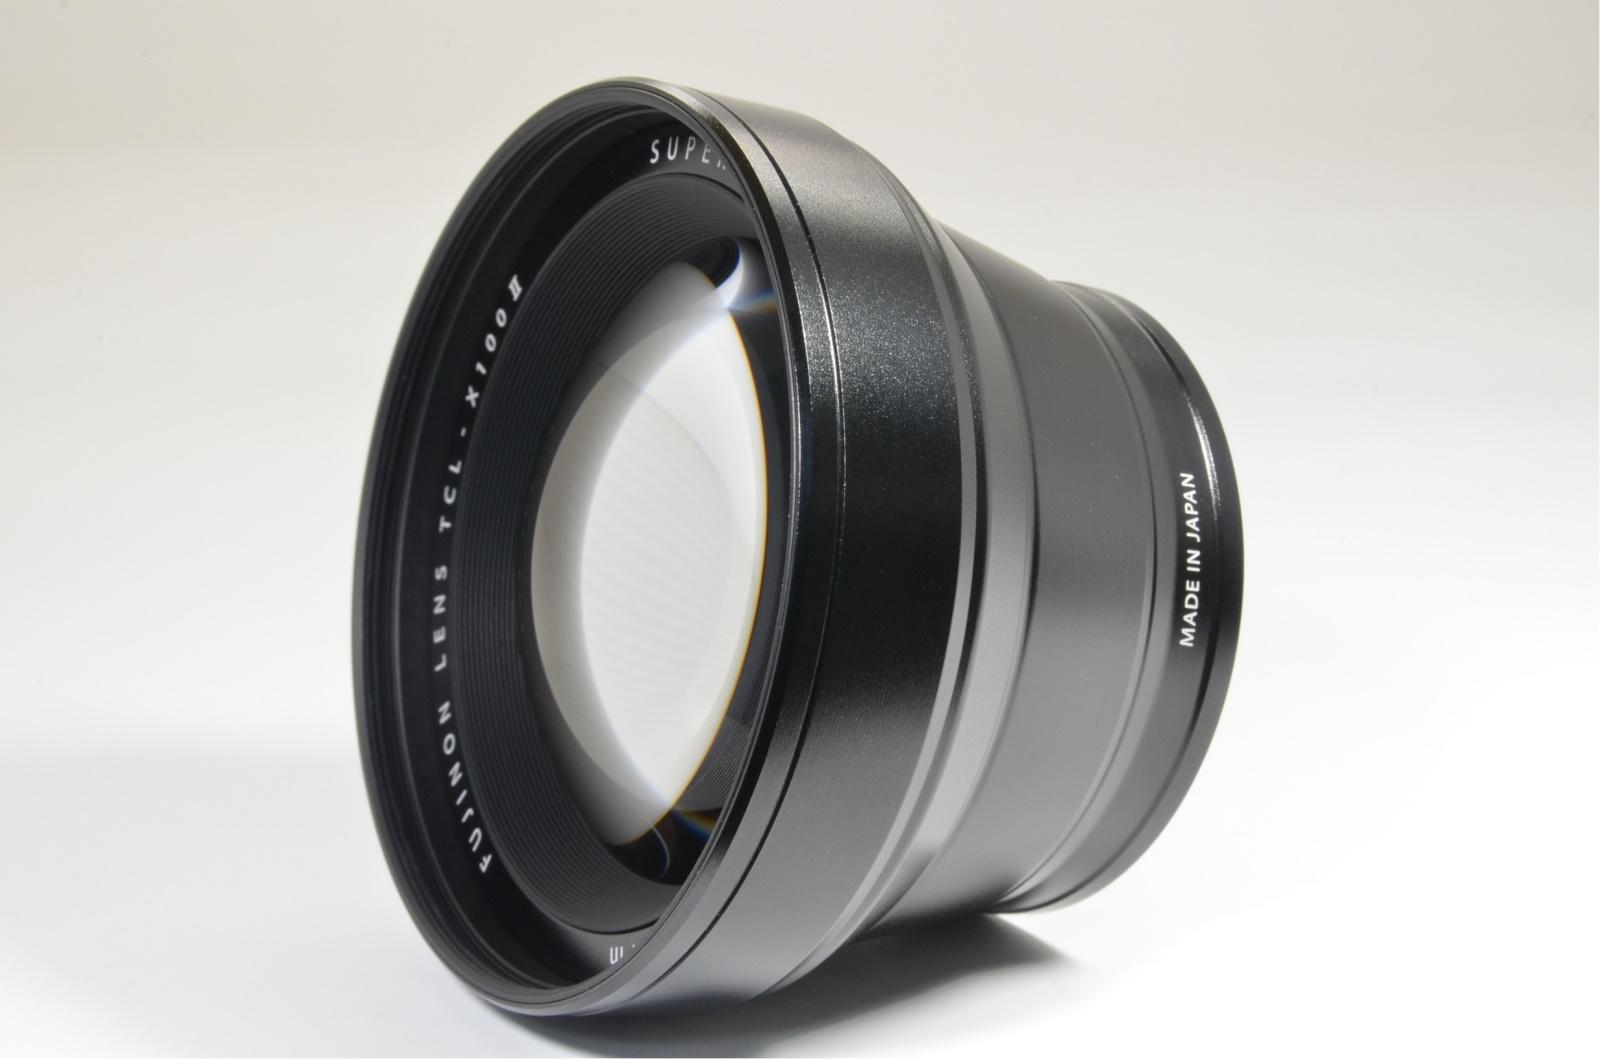 fuji fujifilm tcl-x100 ii tele conversion lens black for x100f x100v